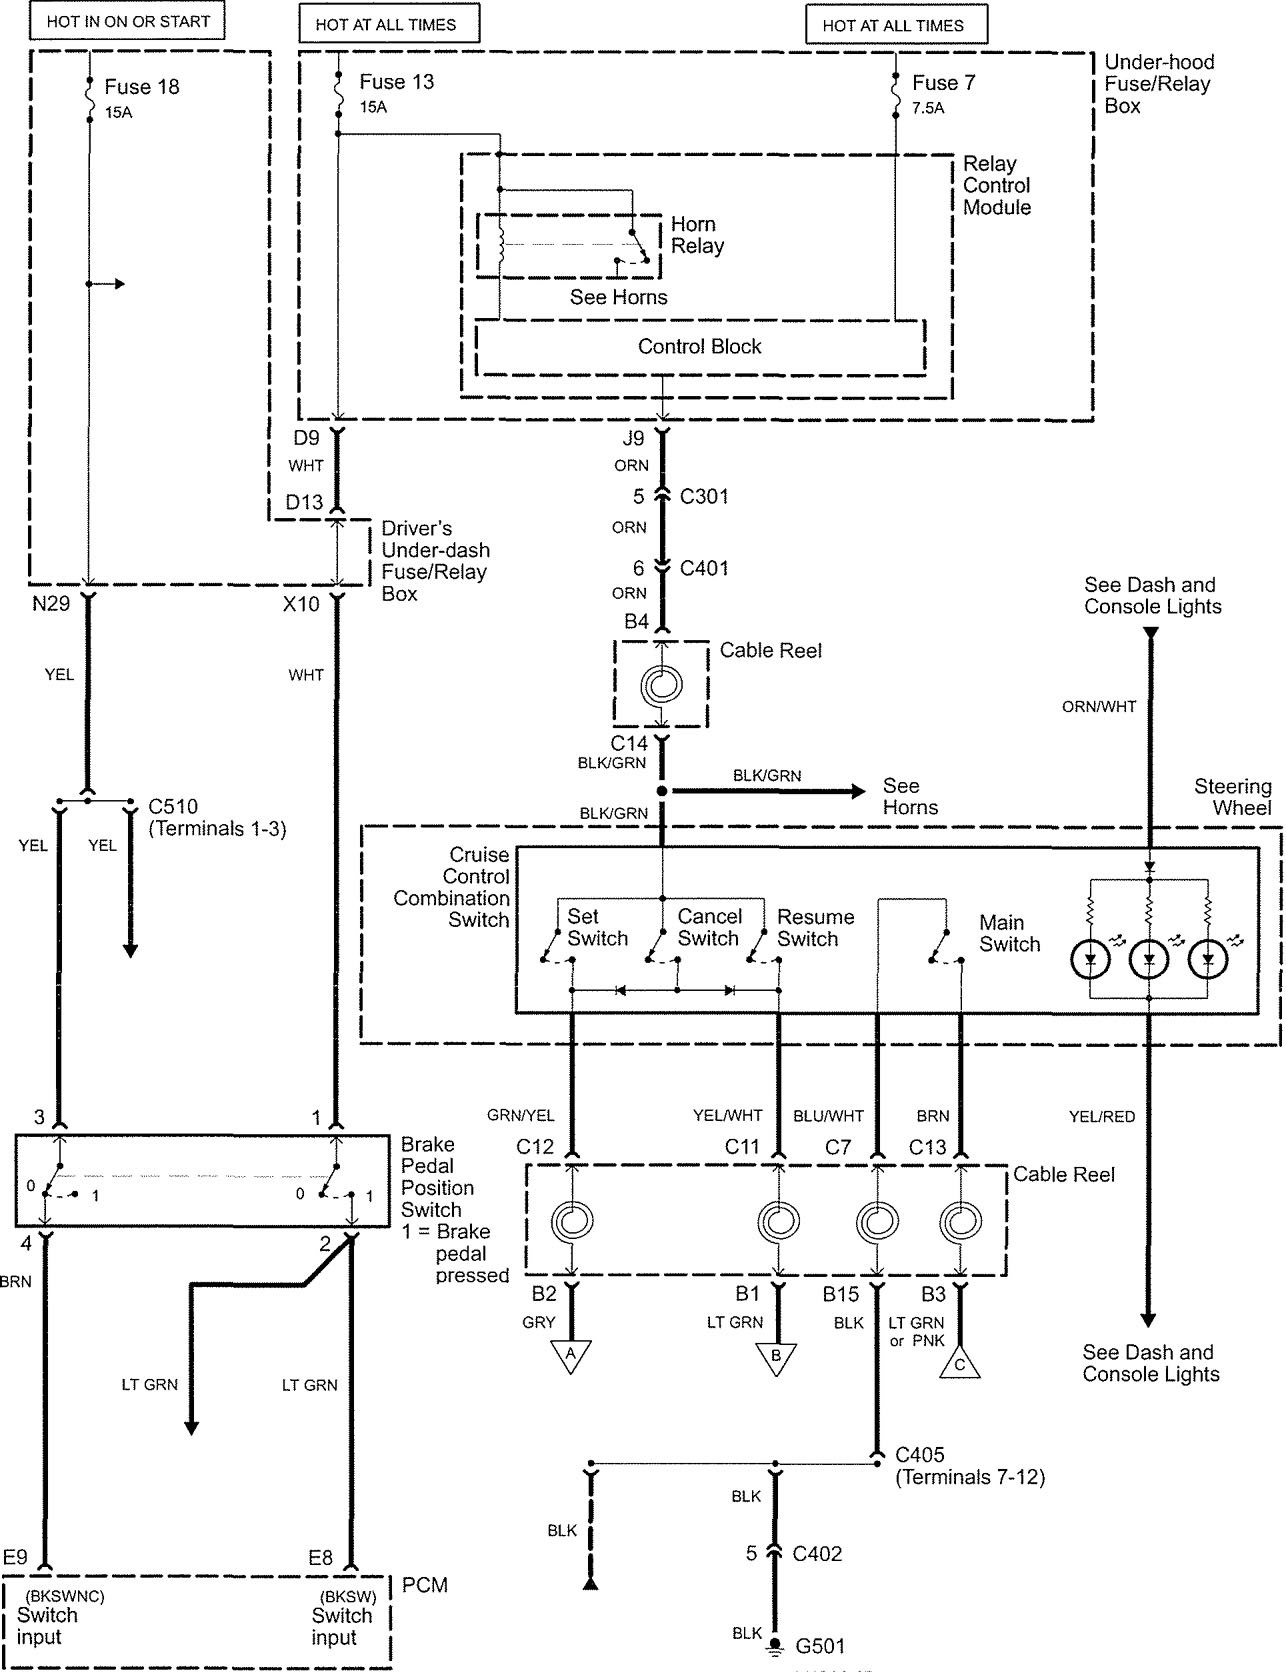 2004 Pontiac Vibe Engine Diagram Electrical Wiring Diagrams 2007 Solstice Fuse Box Gallery Subaru Impreza Wrx